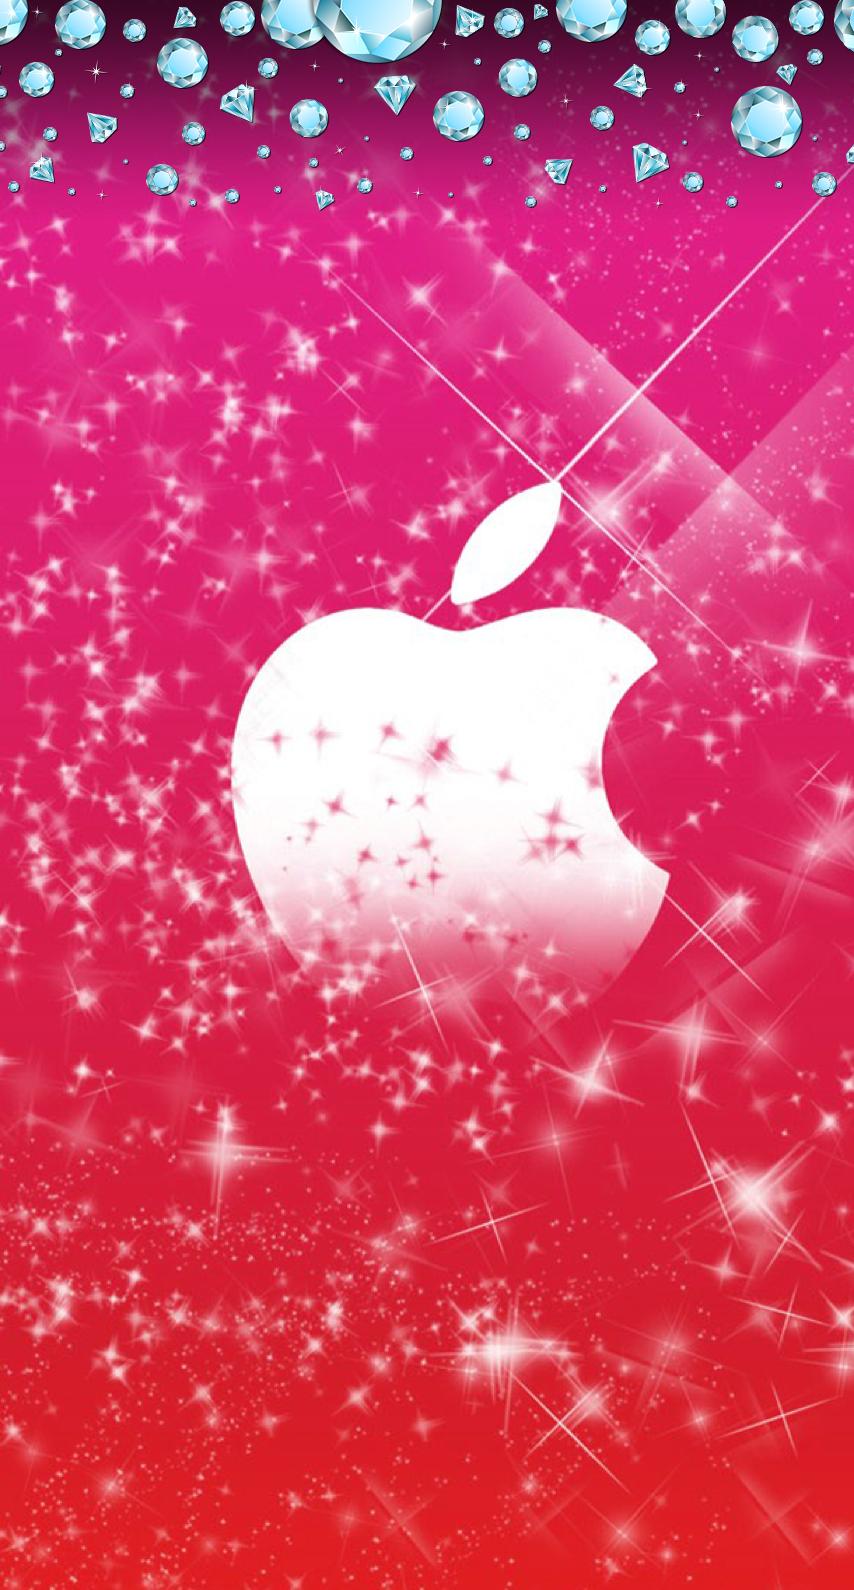 Pretty Apple Logo Wallpaper Pink Wallpaper Iphone Iphone Wallpaper Glitter Abstract Iphone Wallpaper